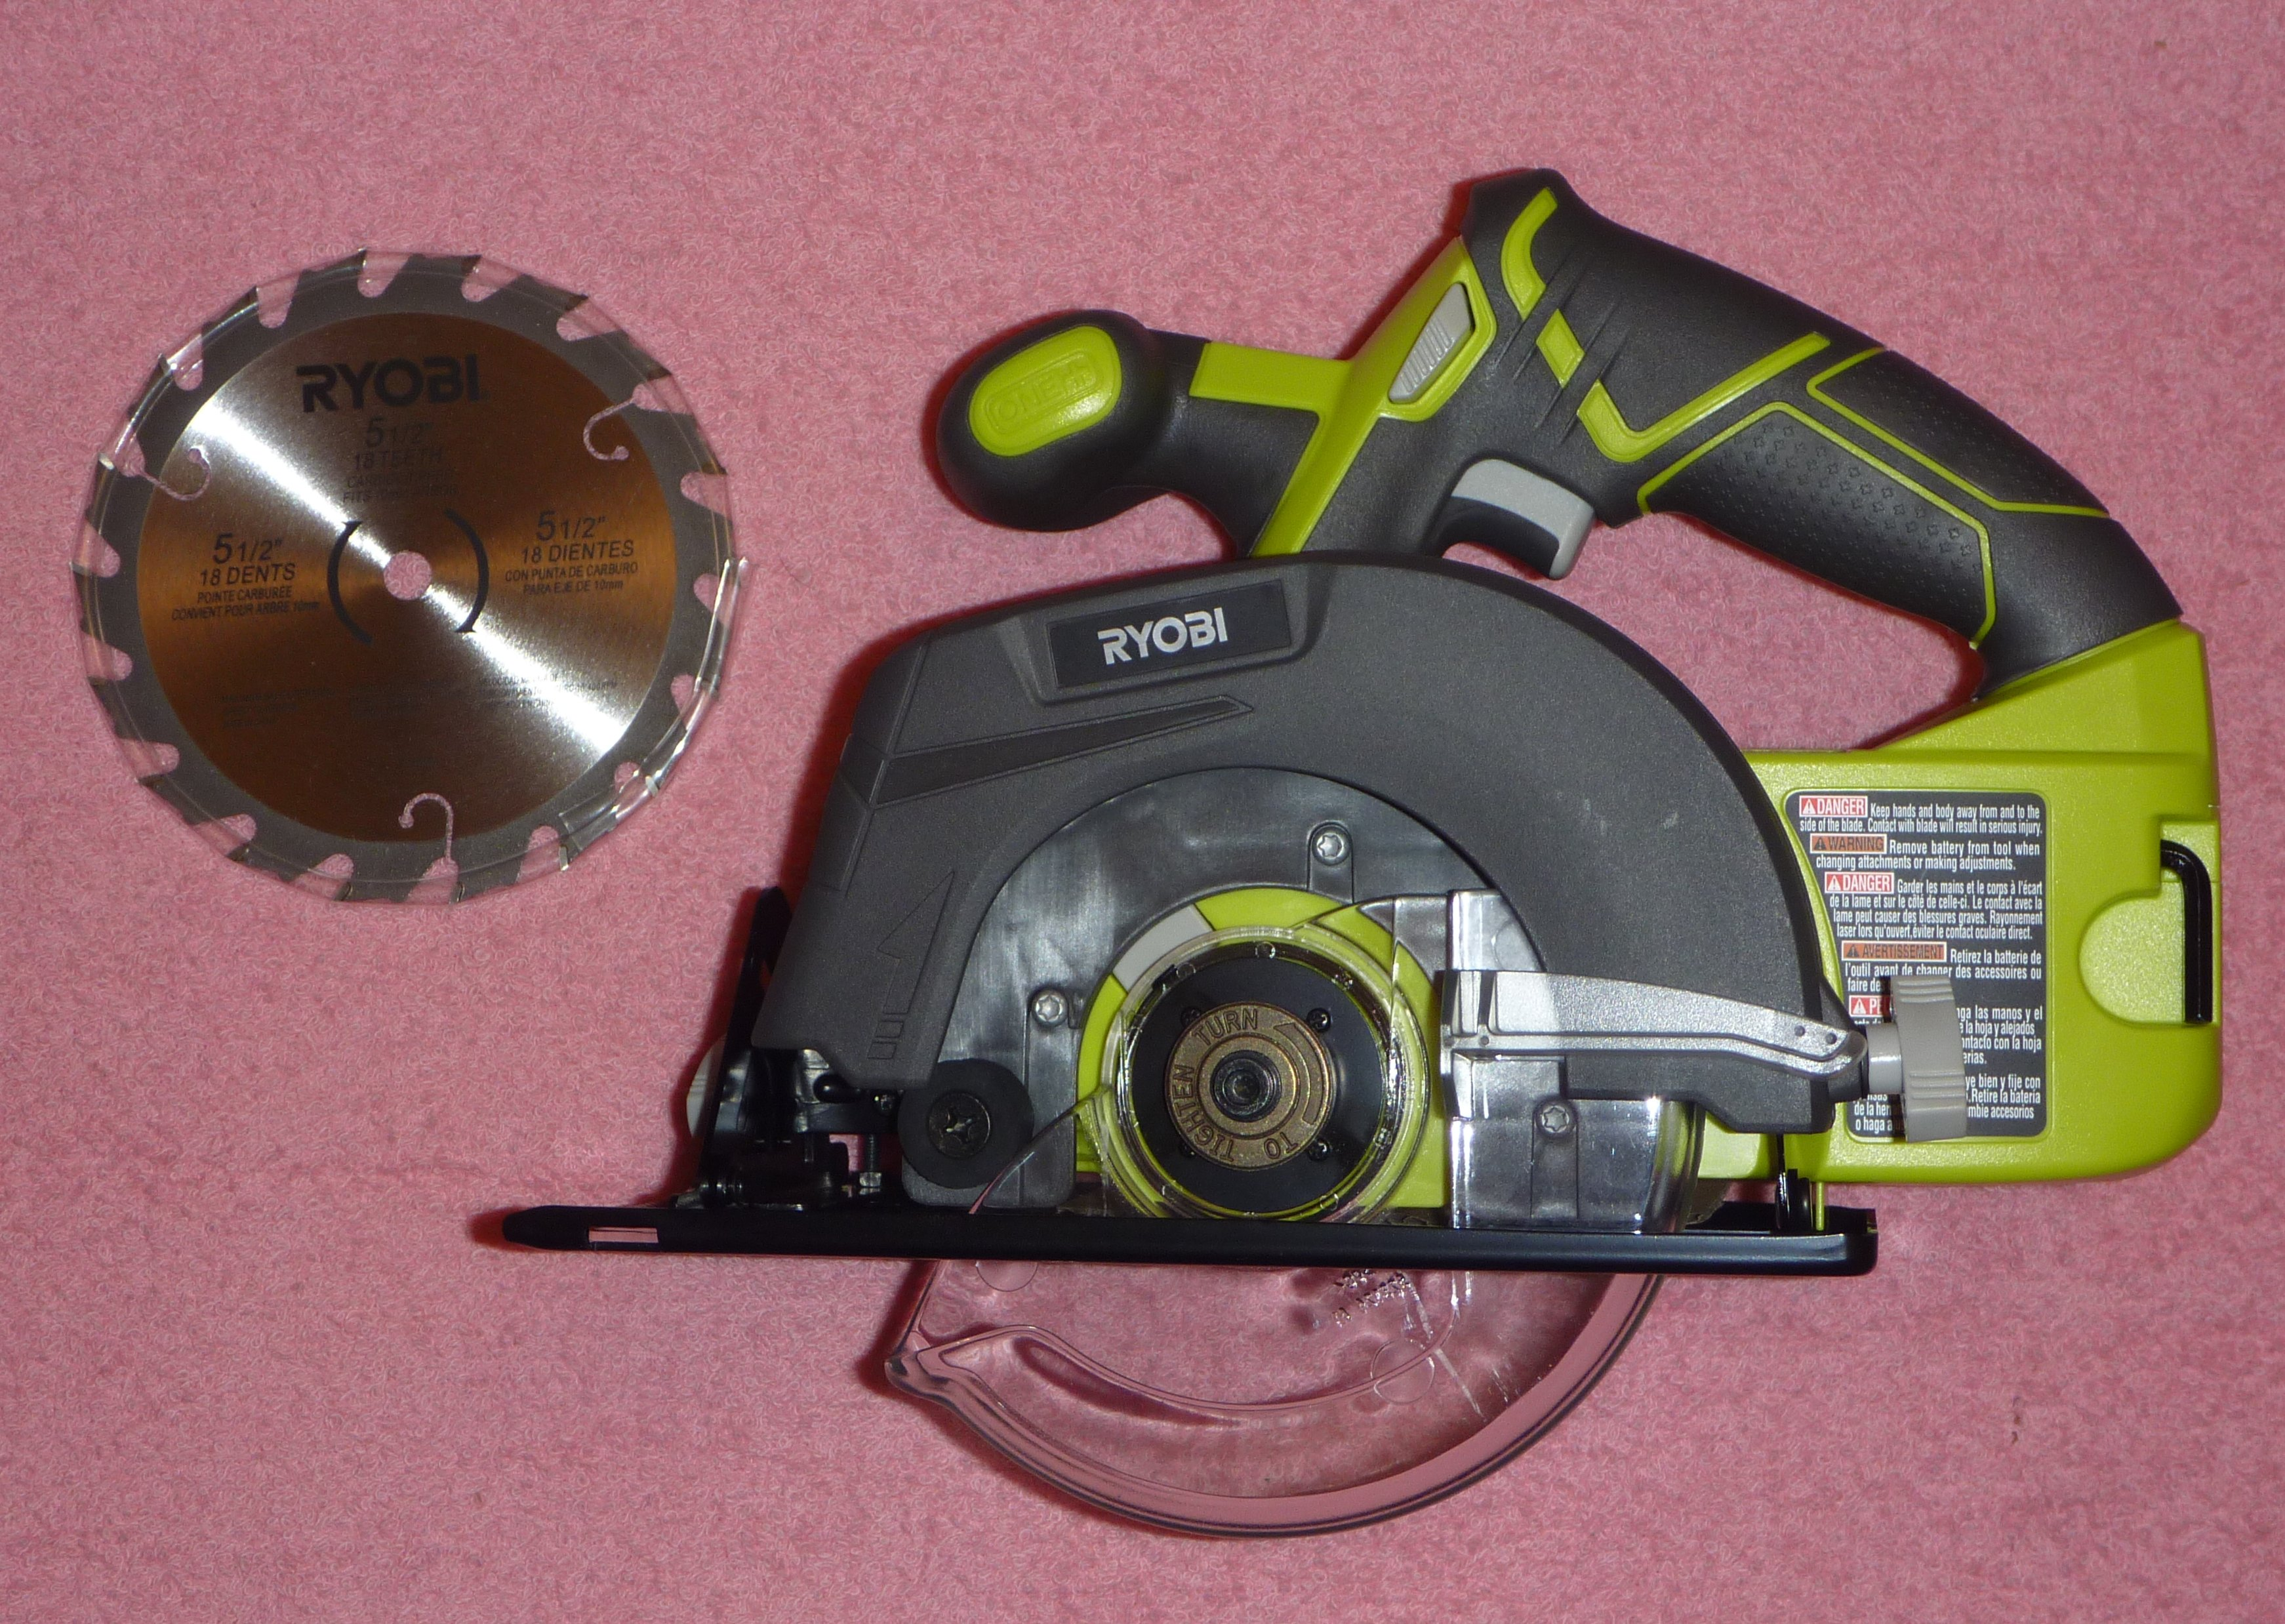 ryobi 5 1 2 circular saw manual